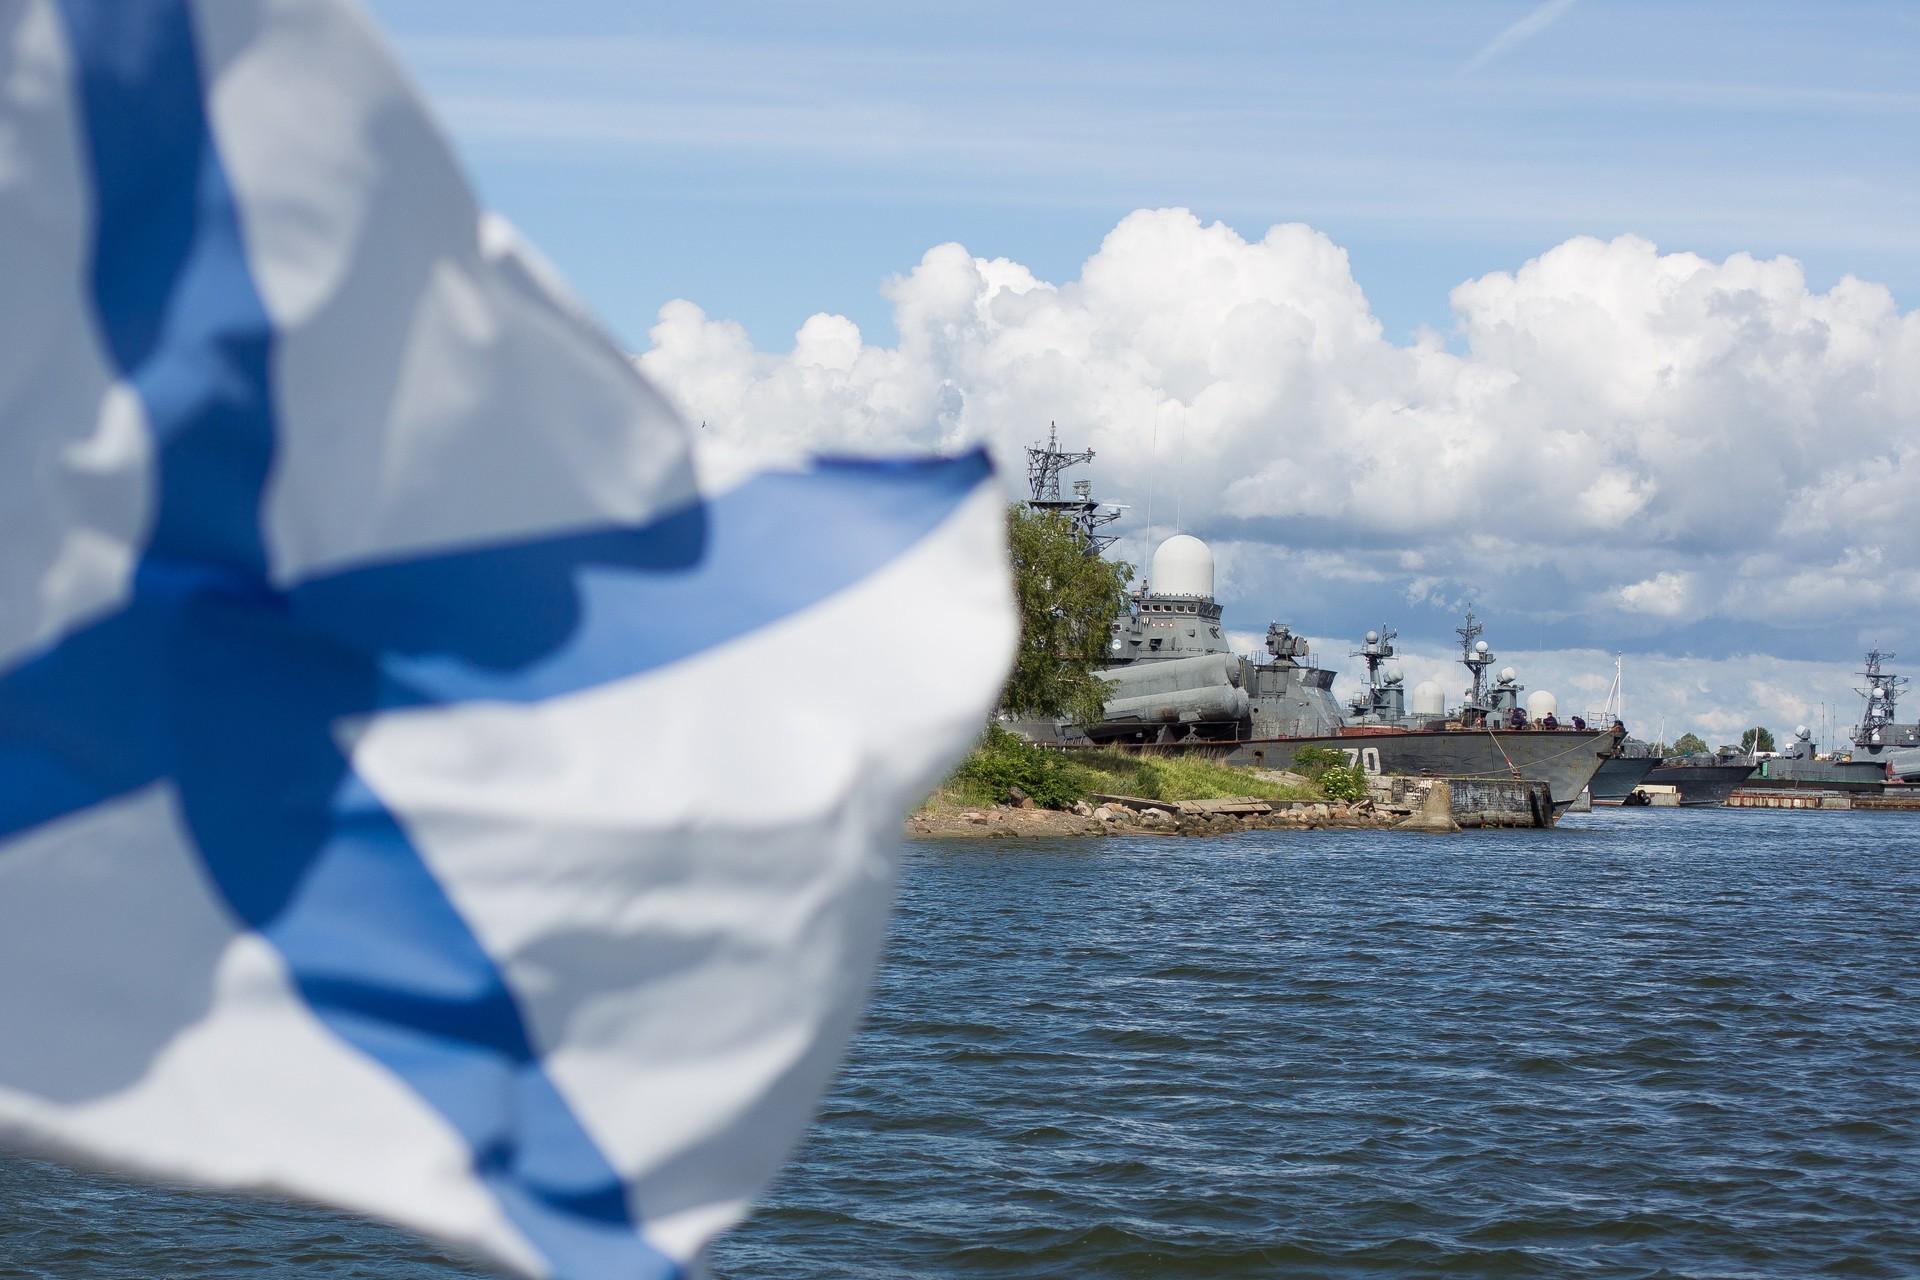 Zastava Ratne mornarice na brodu u Kalinjingradu